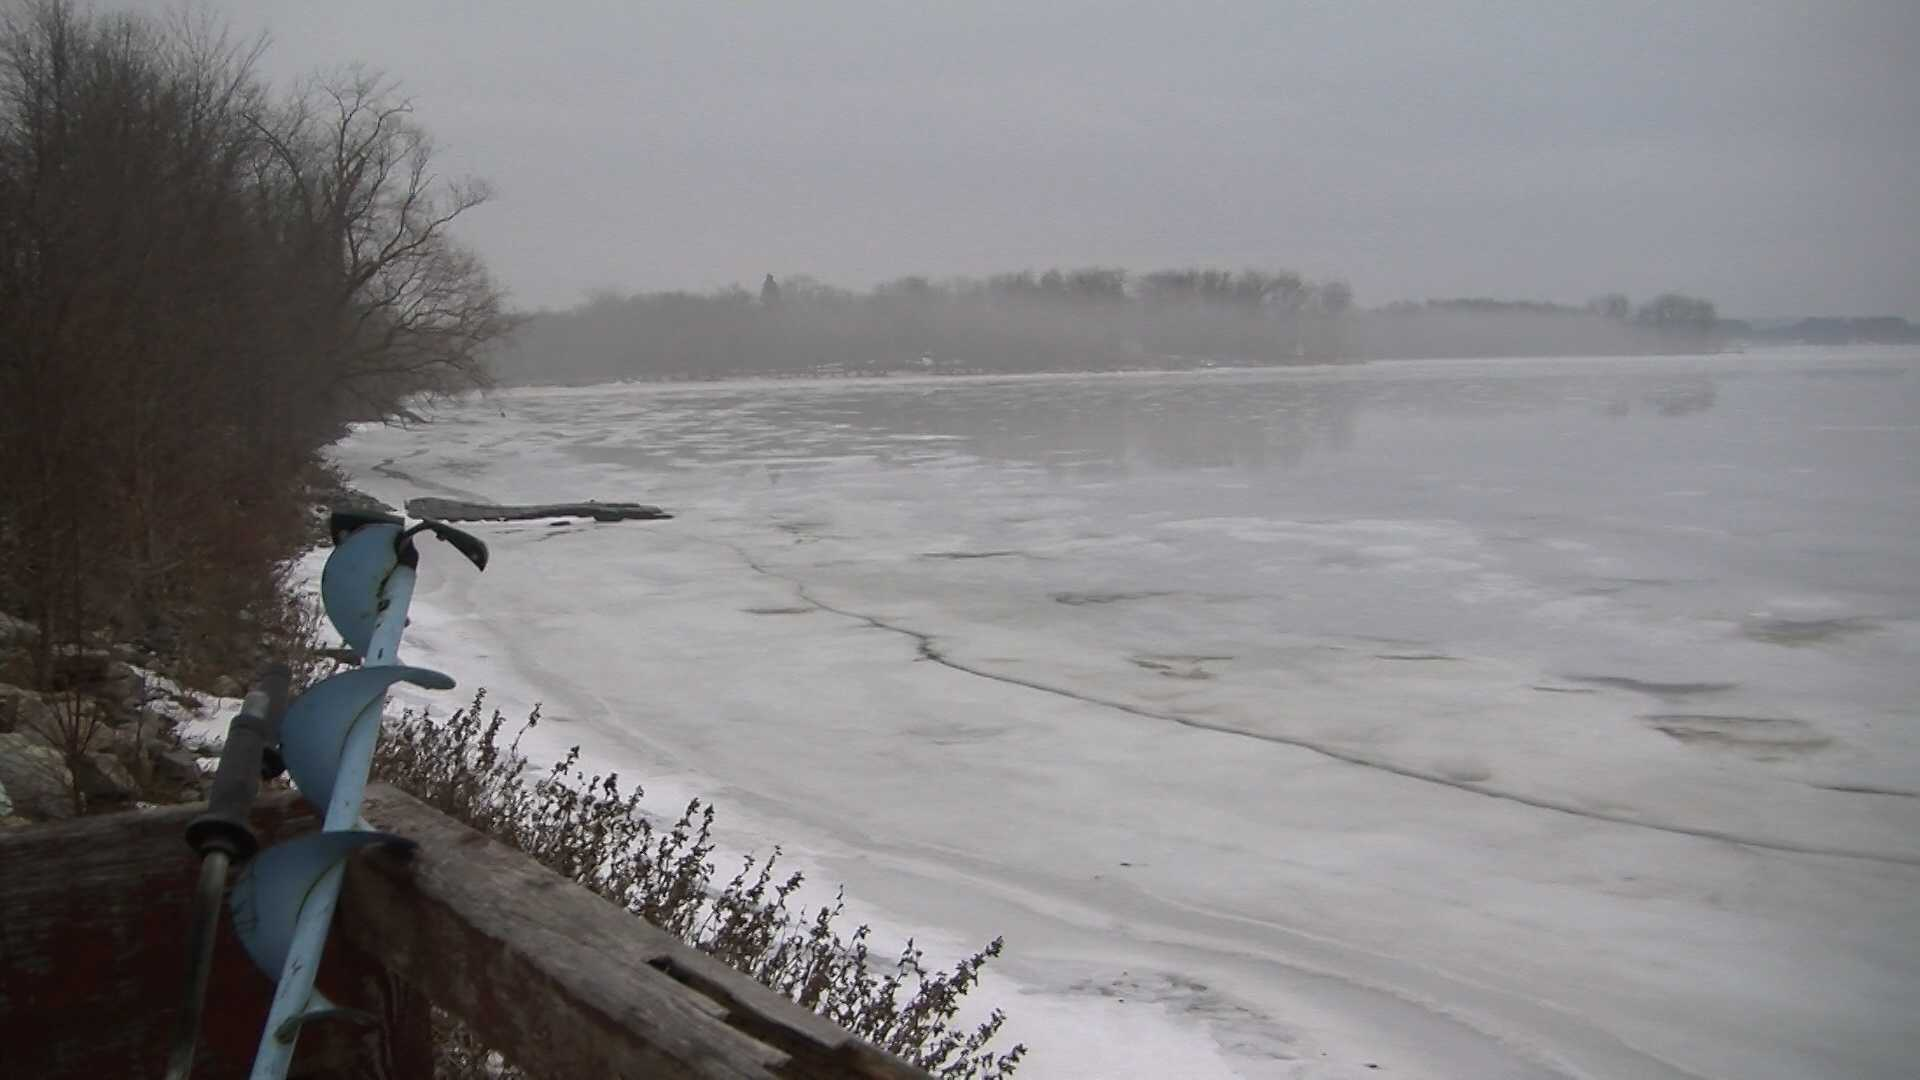 011313 5 fall through ice on Lake Champlain - img